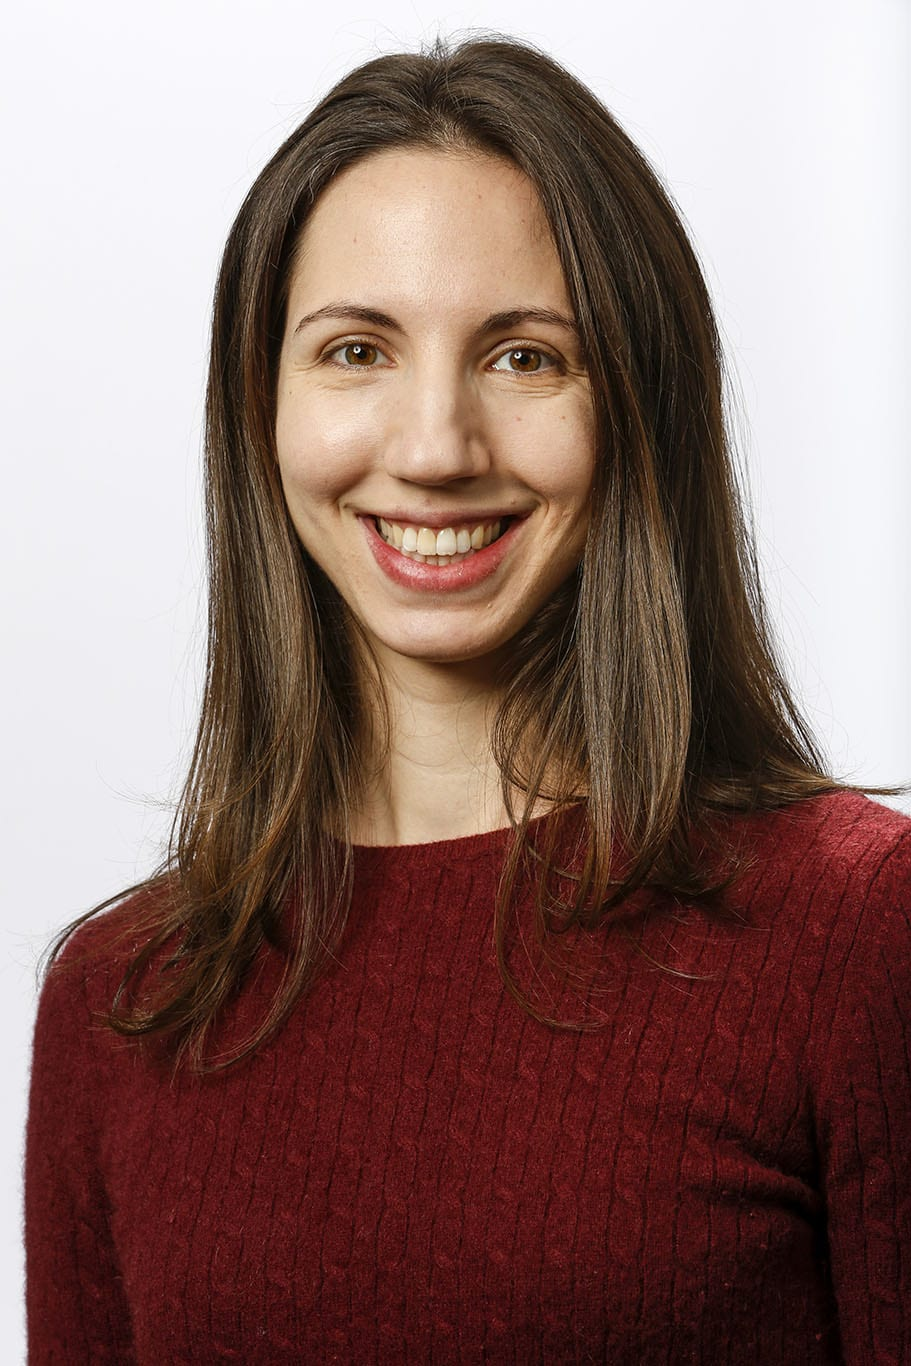 Portrait of Abby Tadenev against a white background.